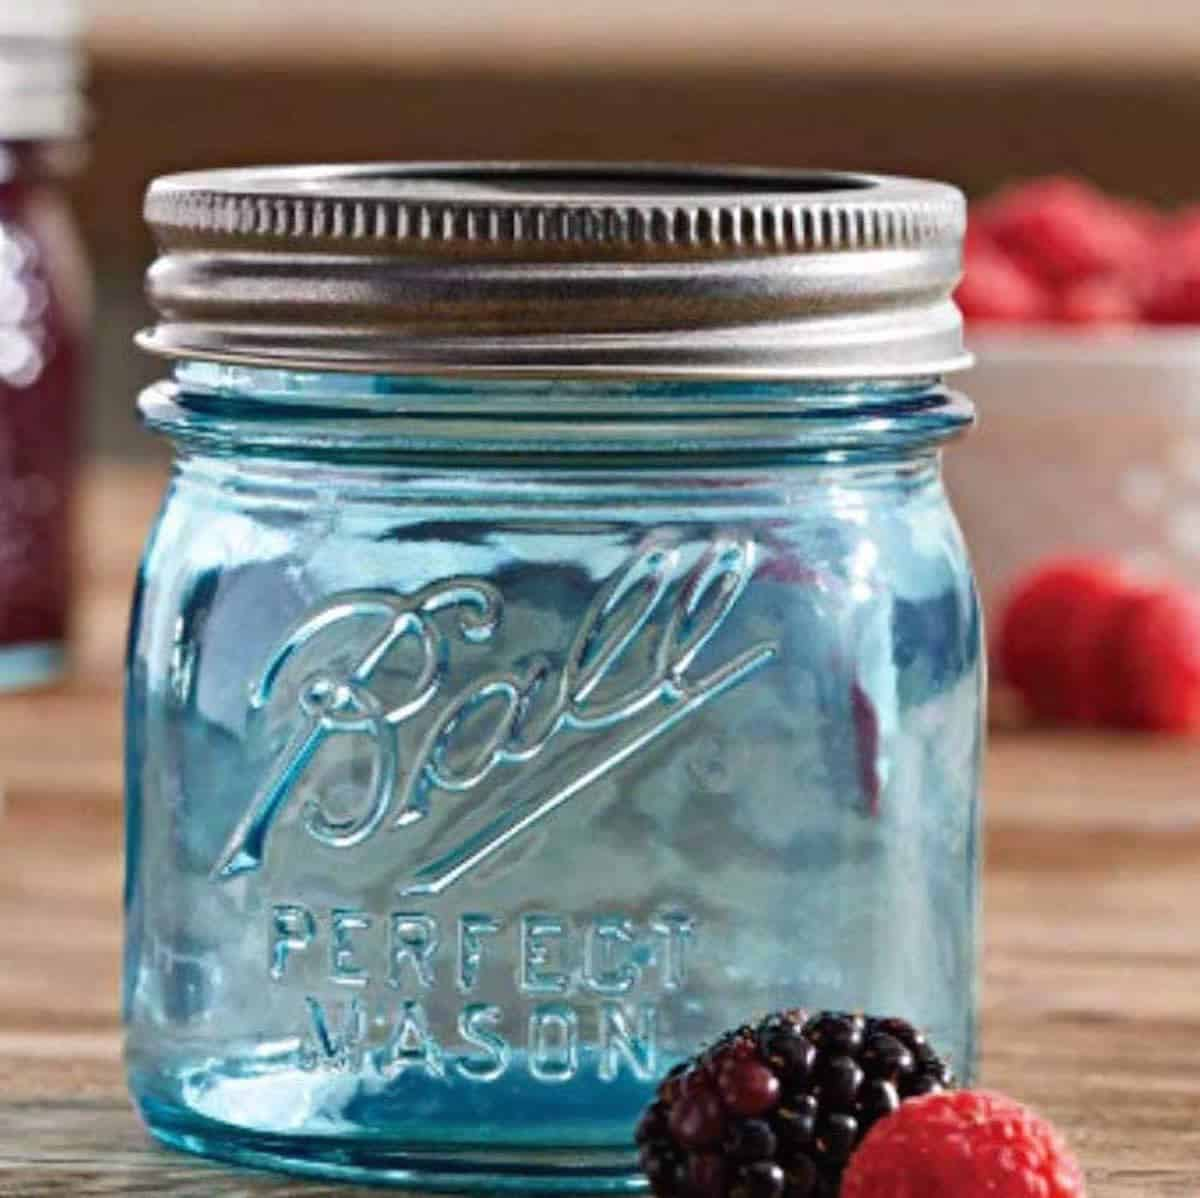 Ball mason jar for jam